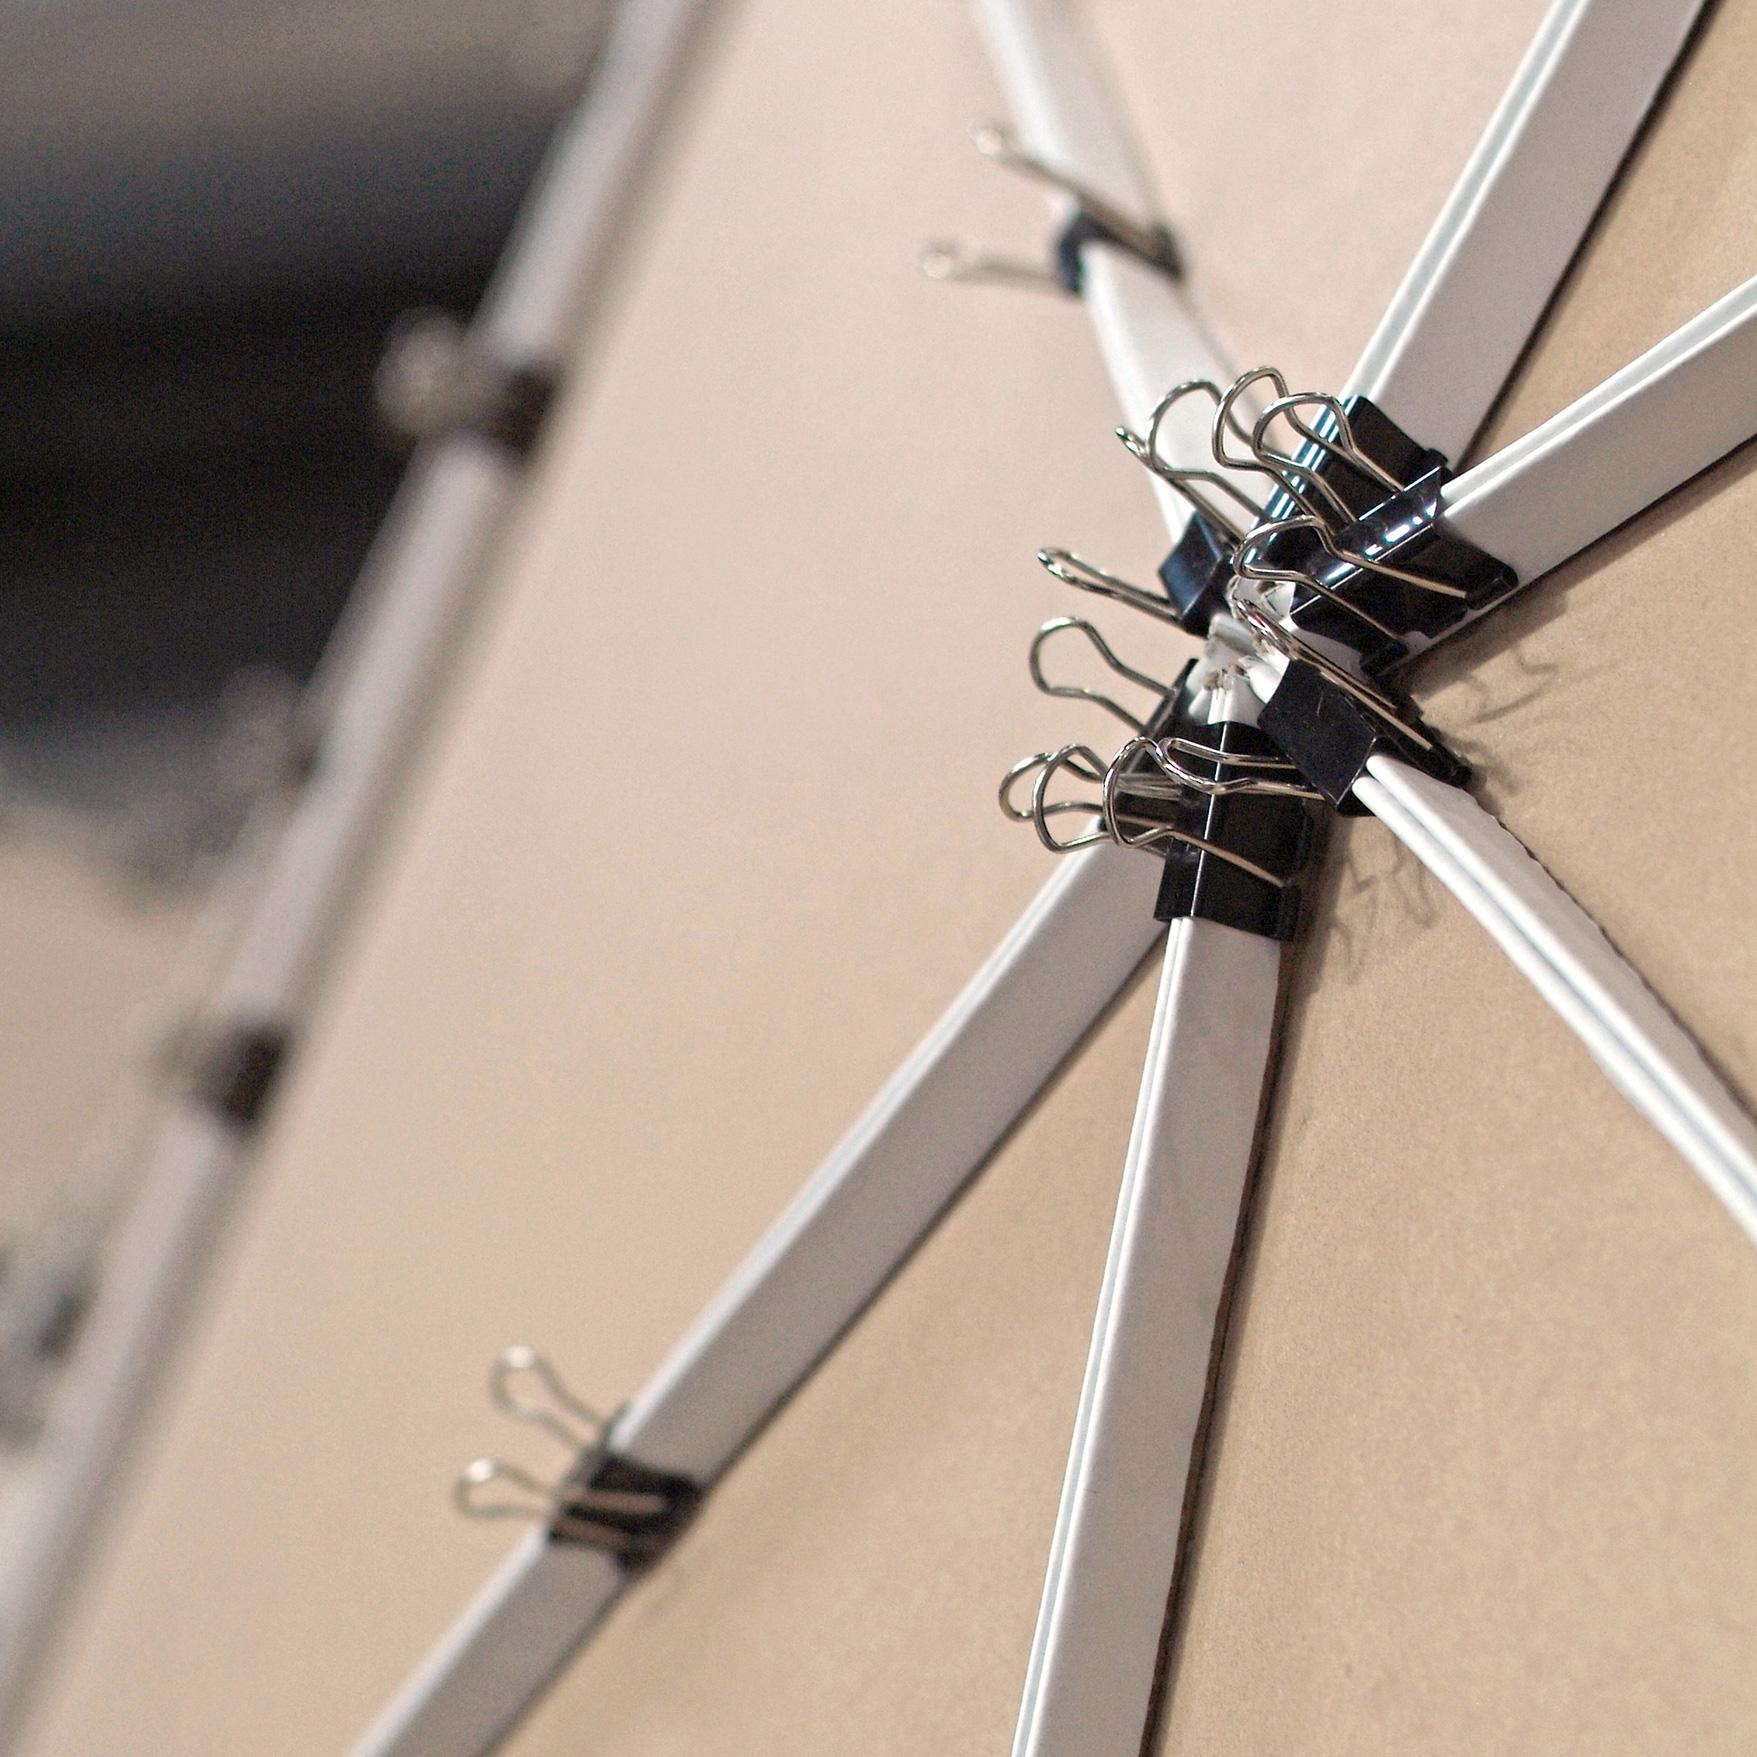 Dome_cardboard-dom-pappe-Anna-dabrowski-design-berlin-fotografie-fotograf-designer